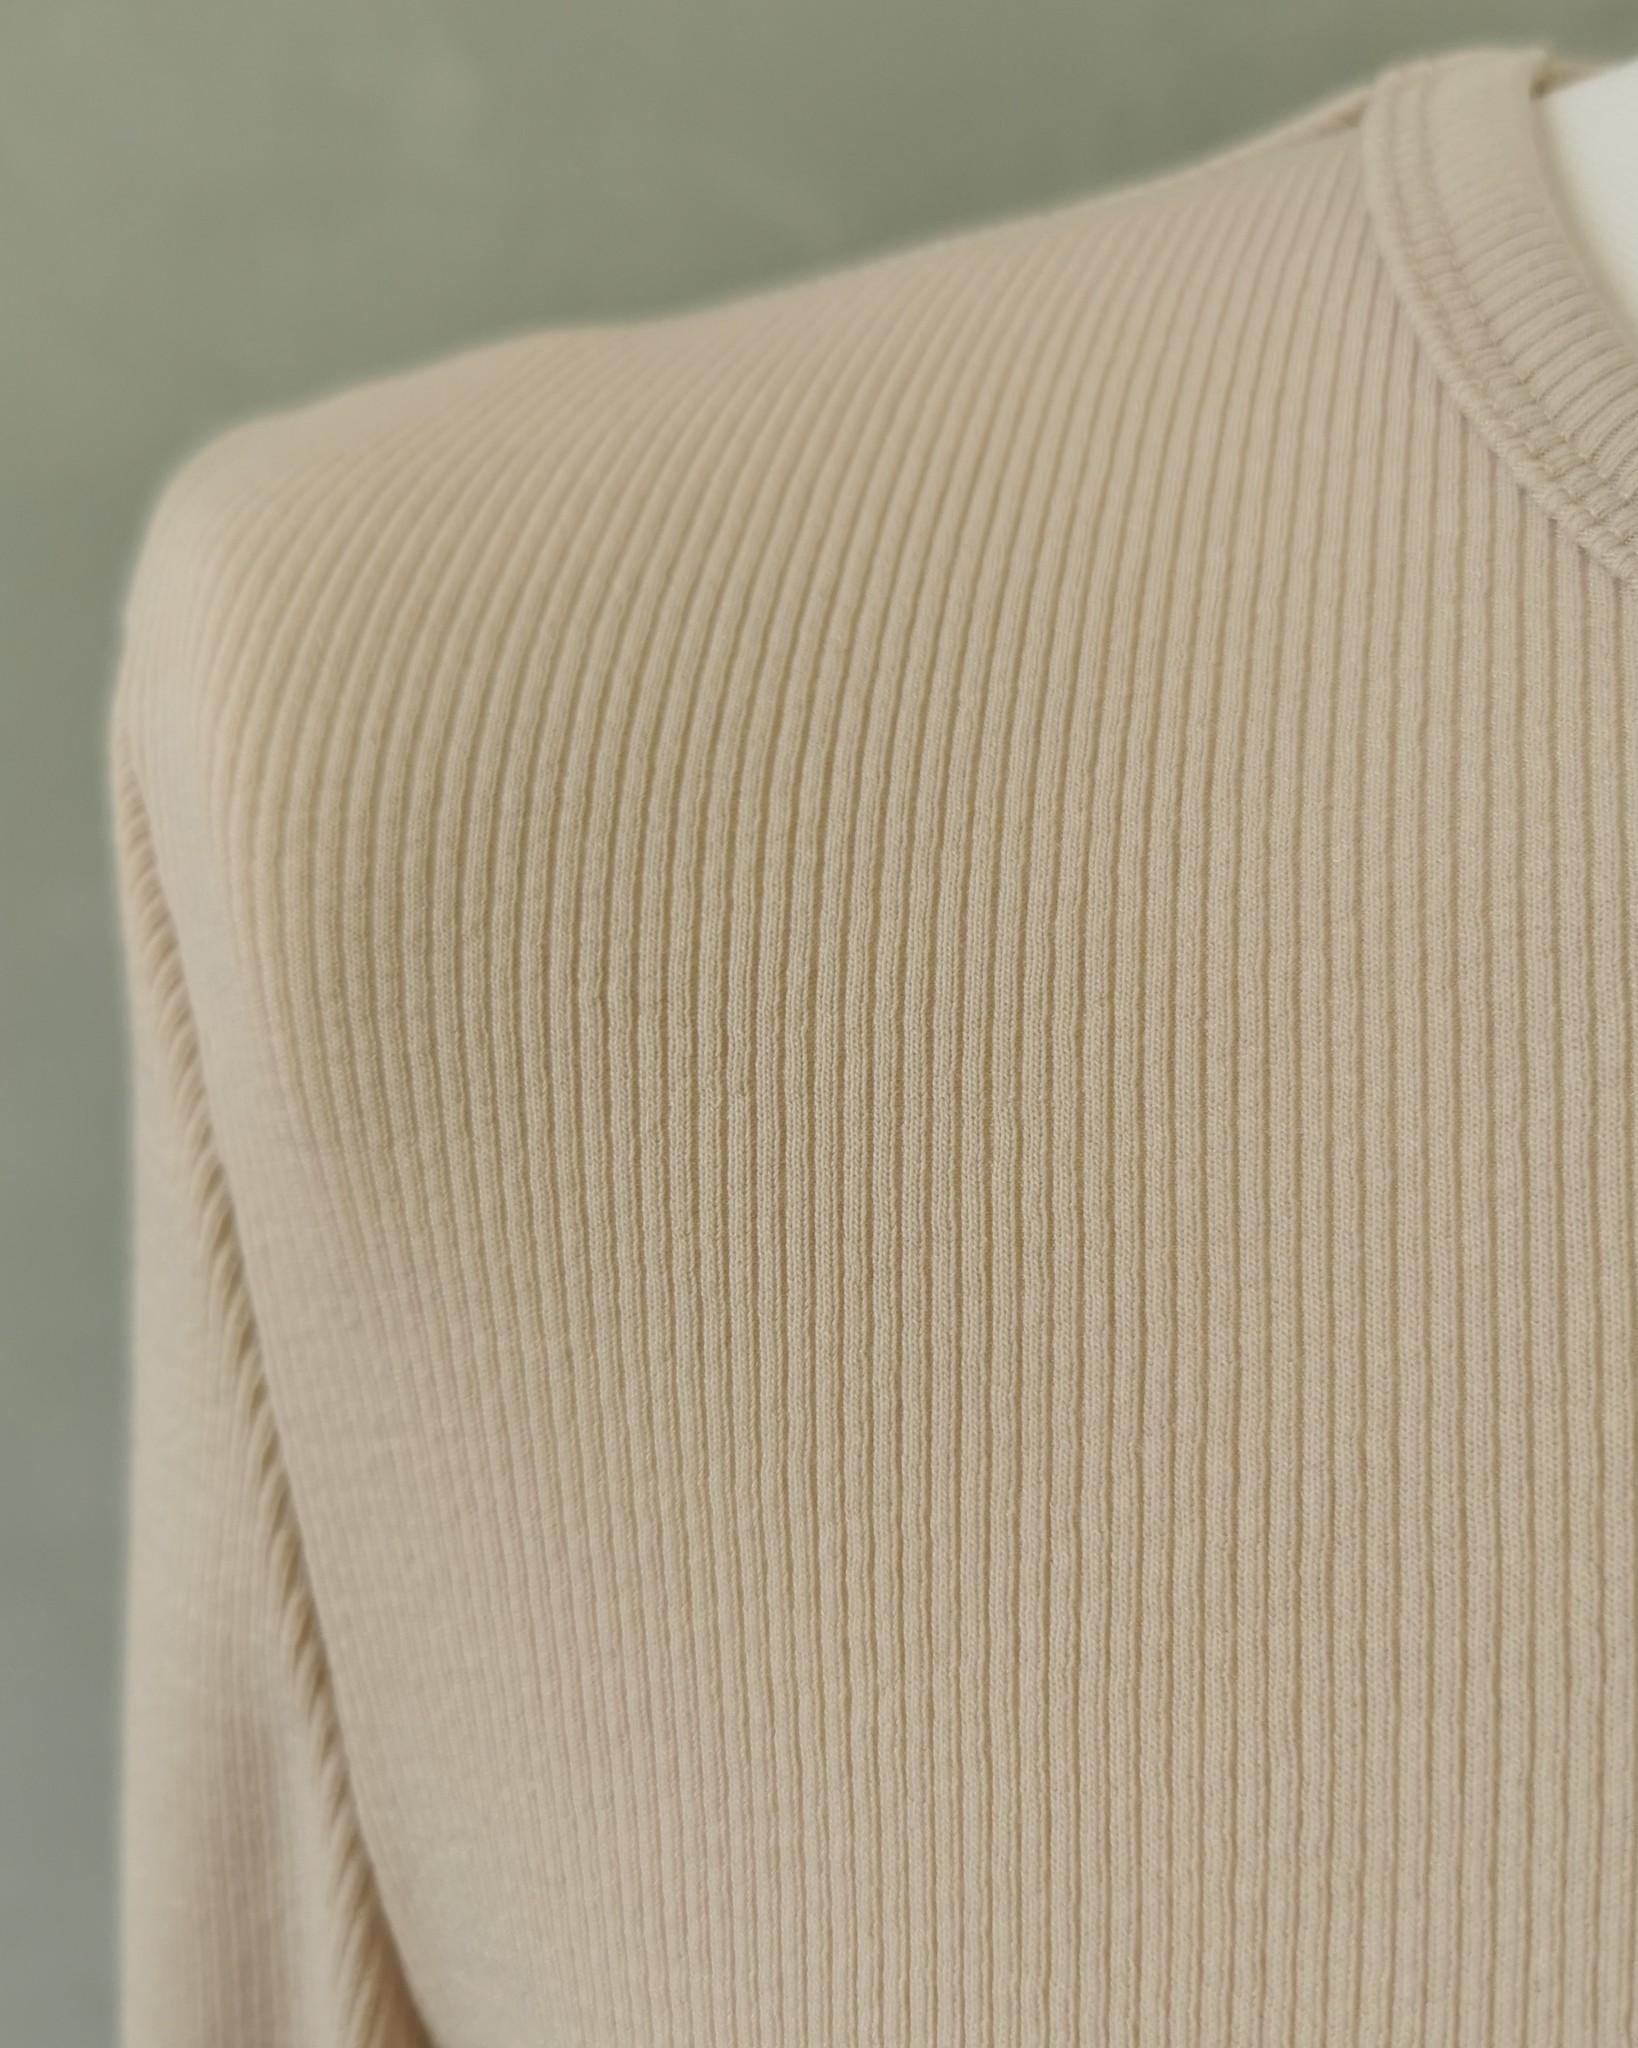 Jersey body jurk acciaroli II licht beige